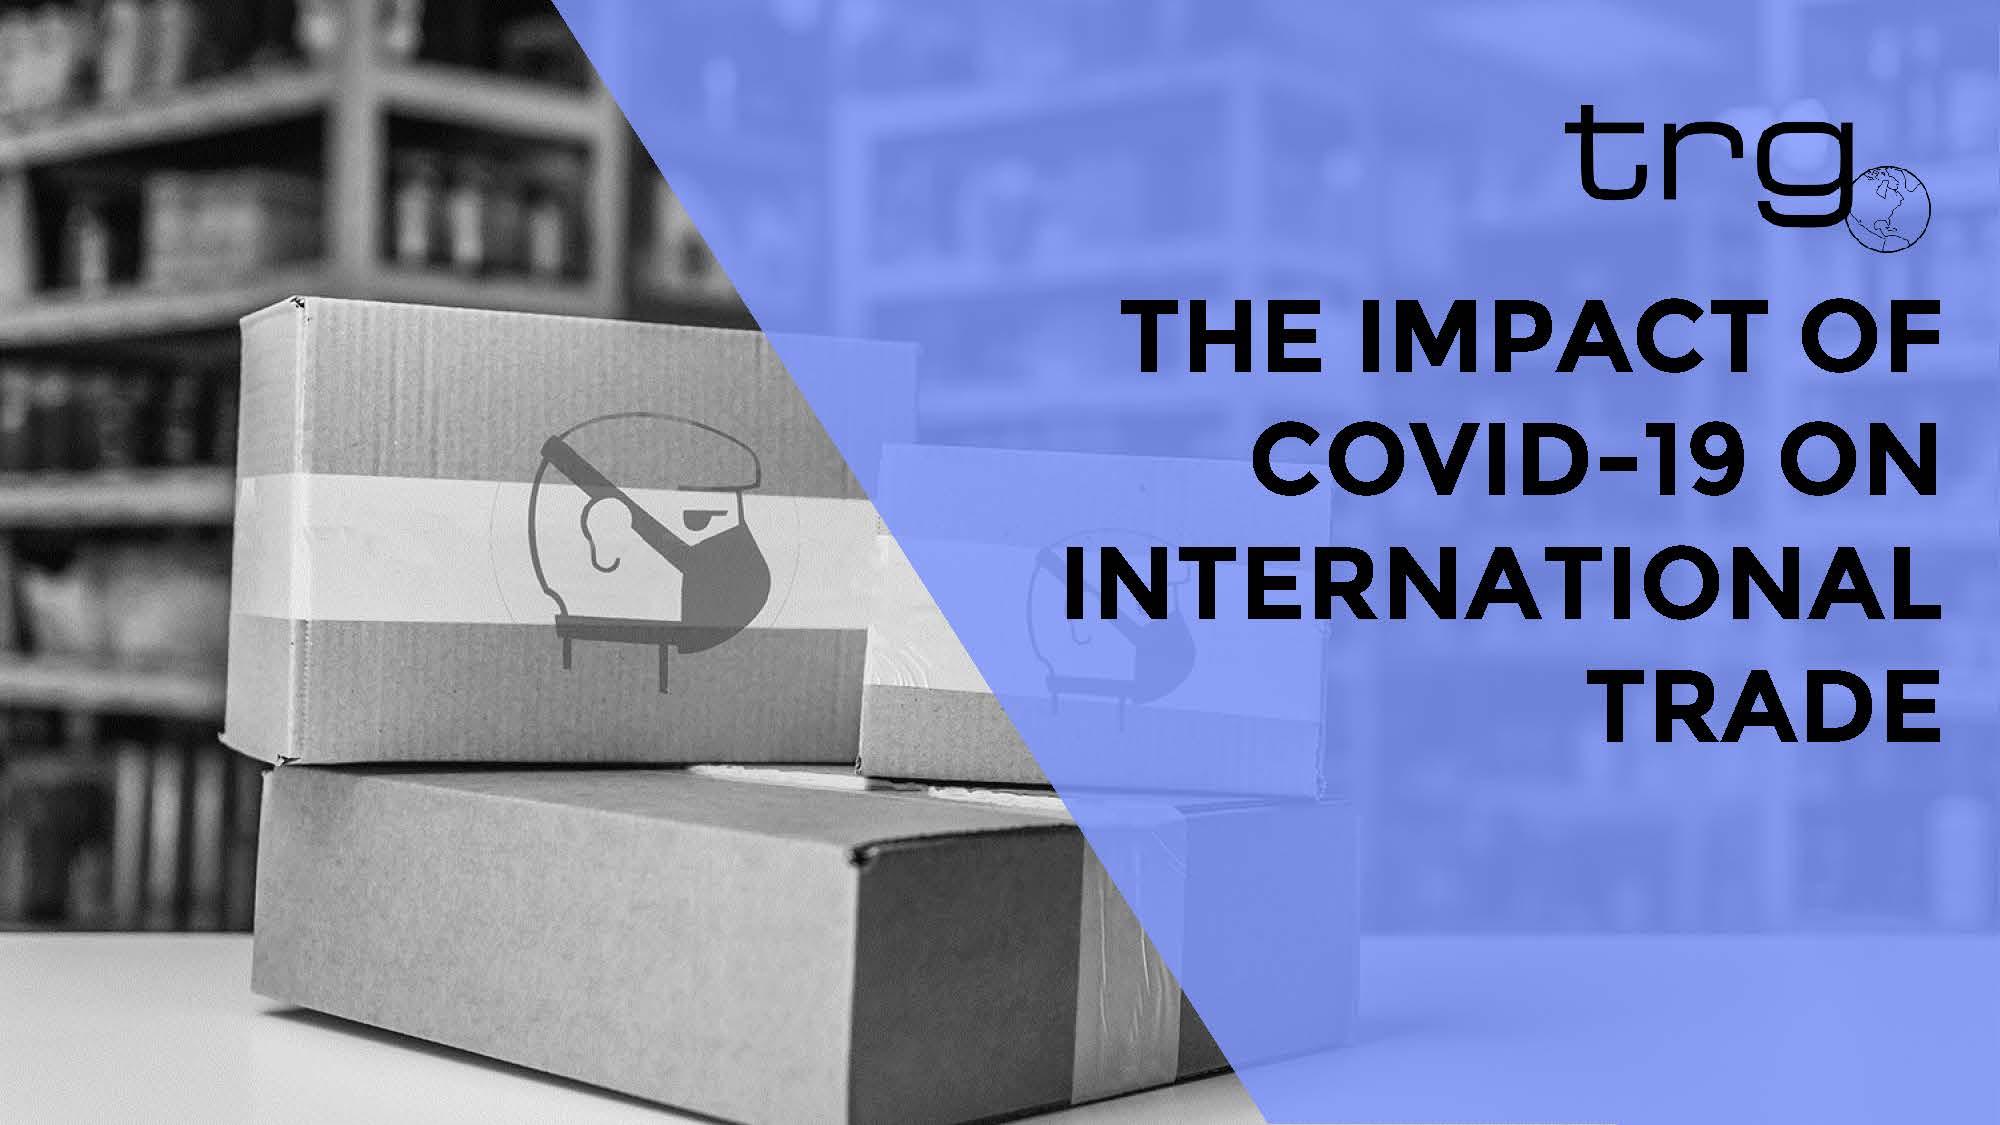 [Webinar] The Impact of COVID 19 on International Trade